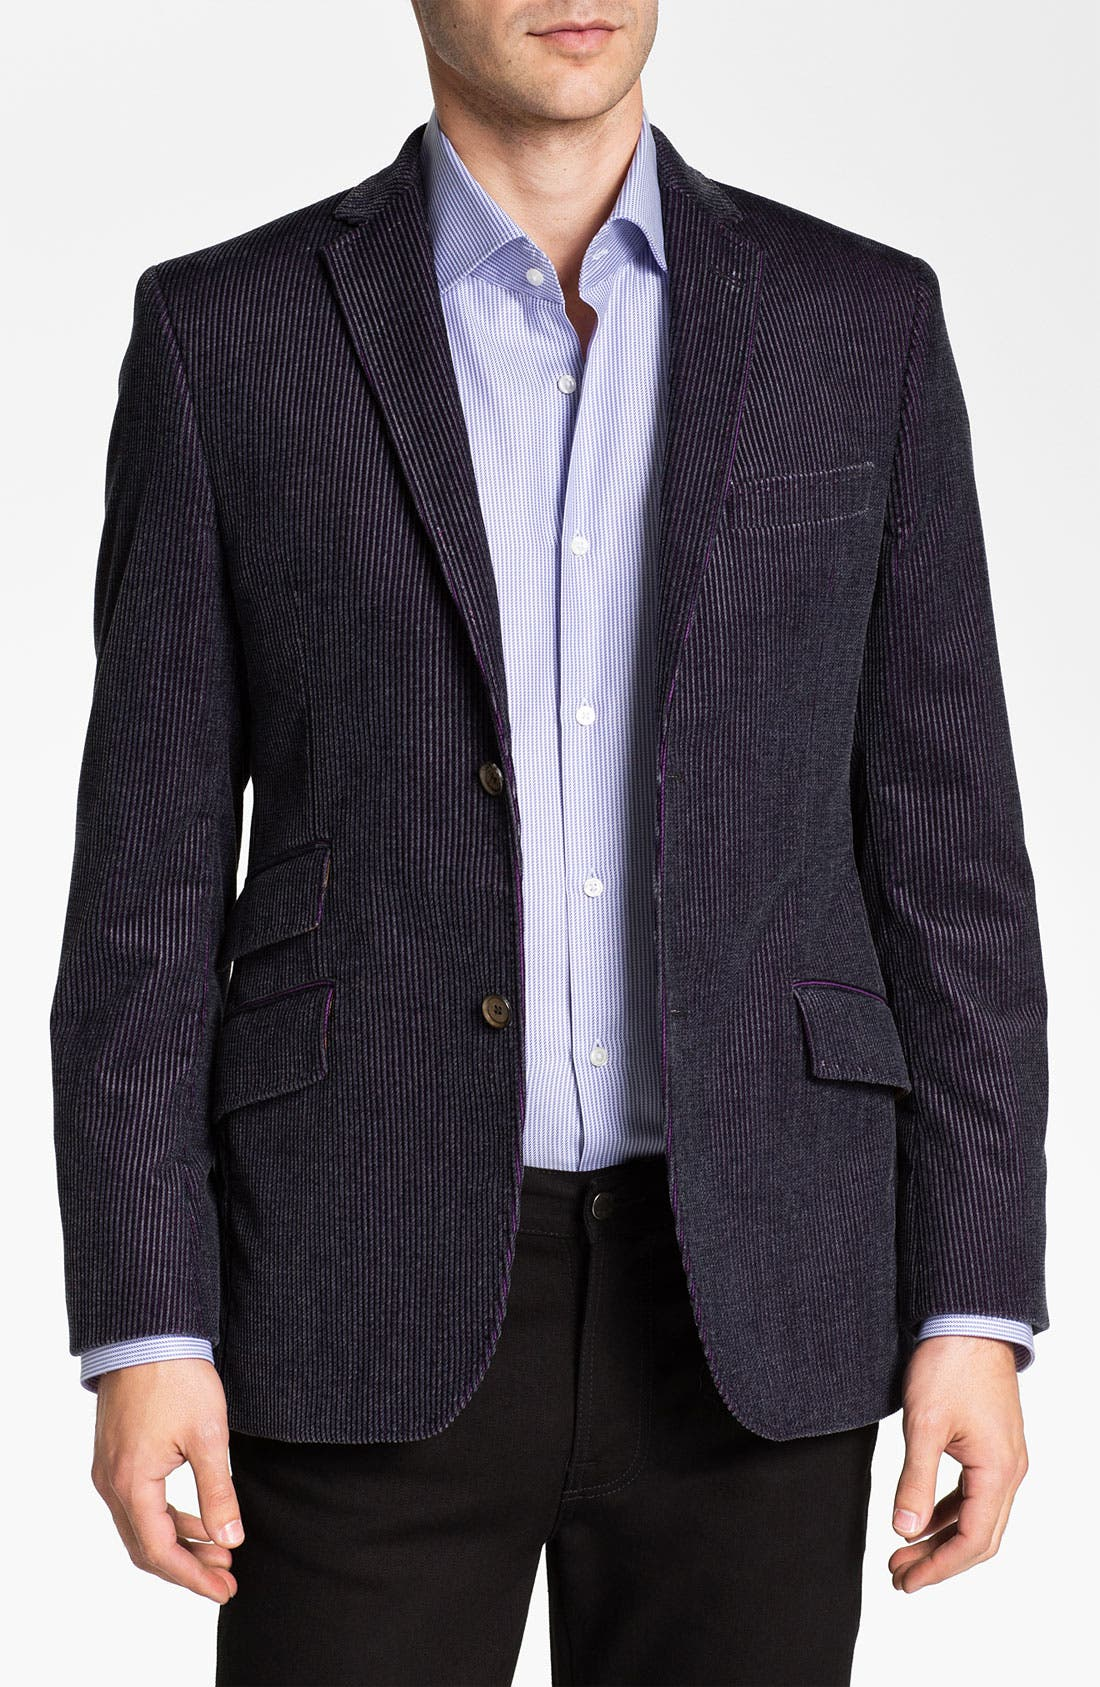 Main Image - Ted Baker London 'Global' Trim Fit Corduroy Sportcoat